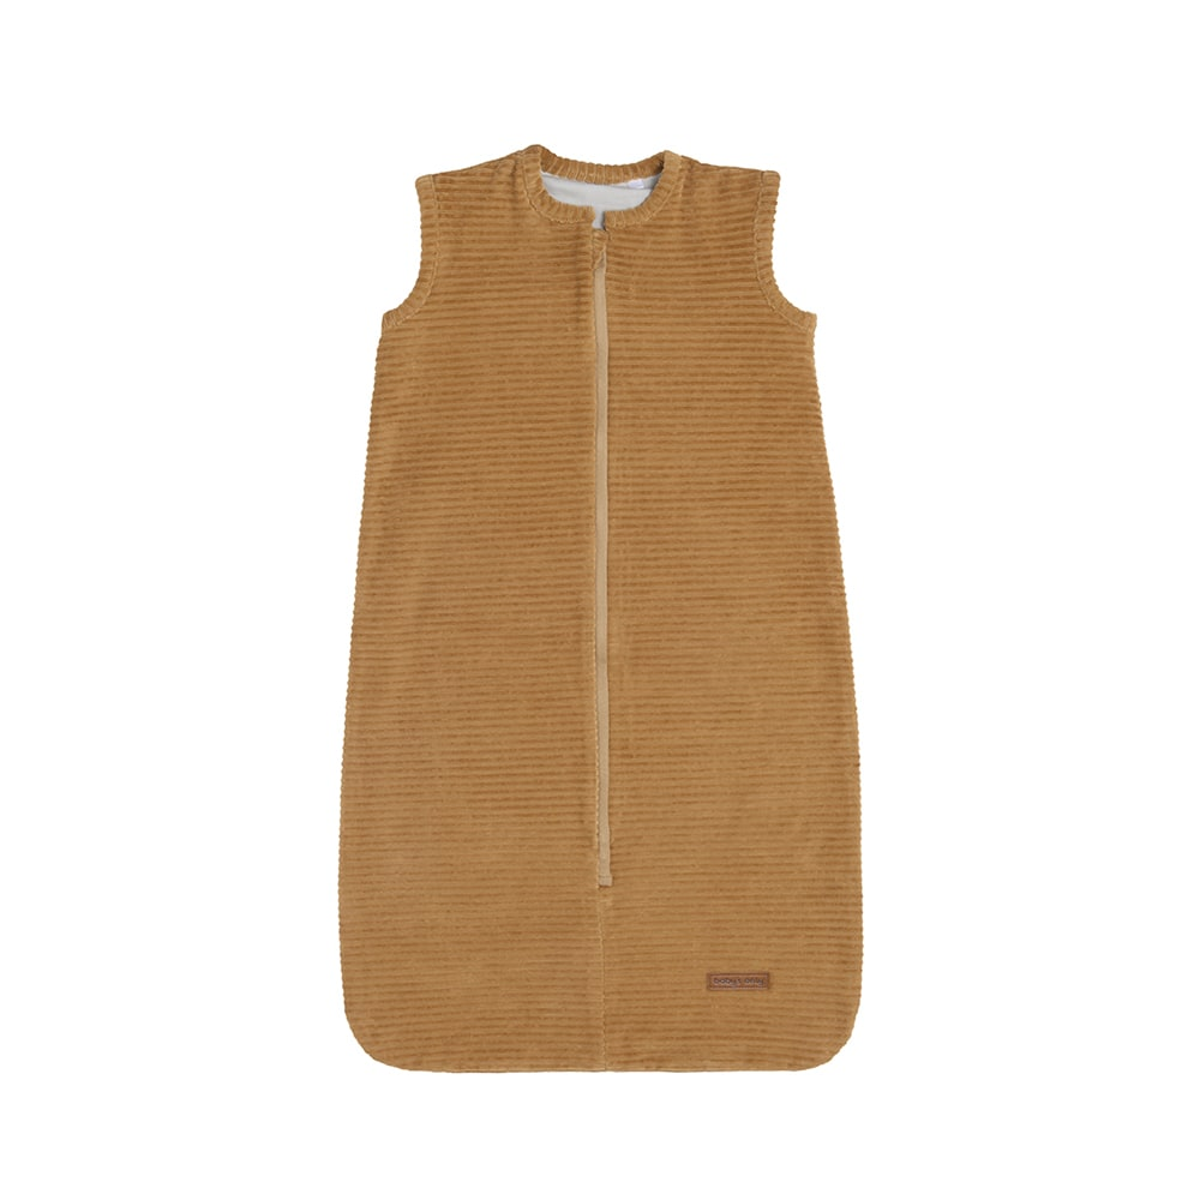 sleeping bag sense caramel 90 cm